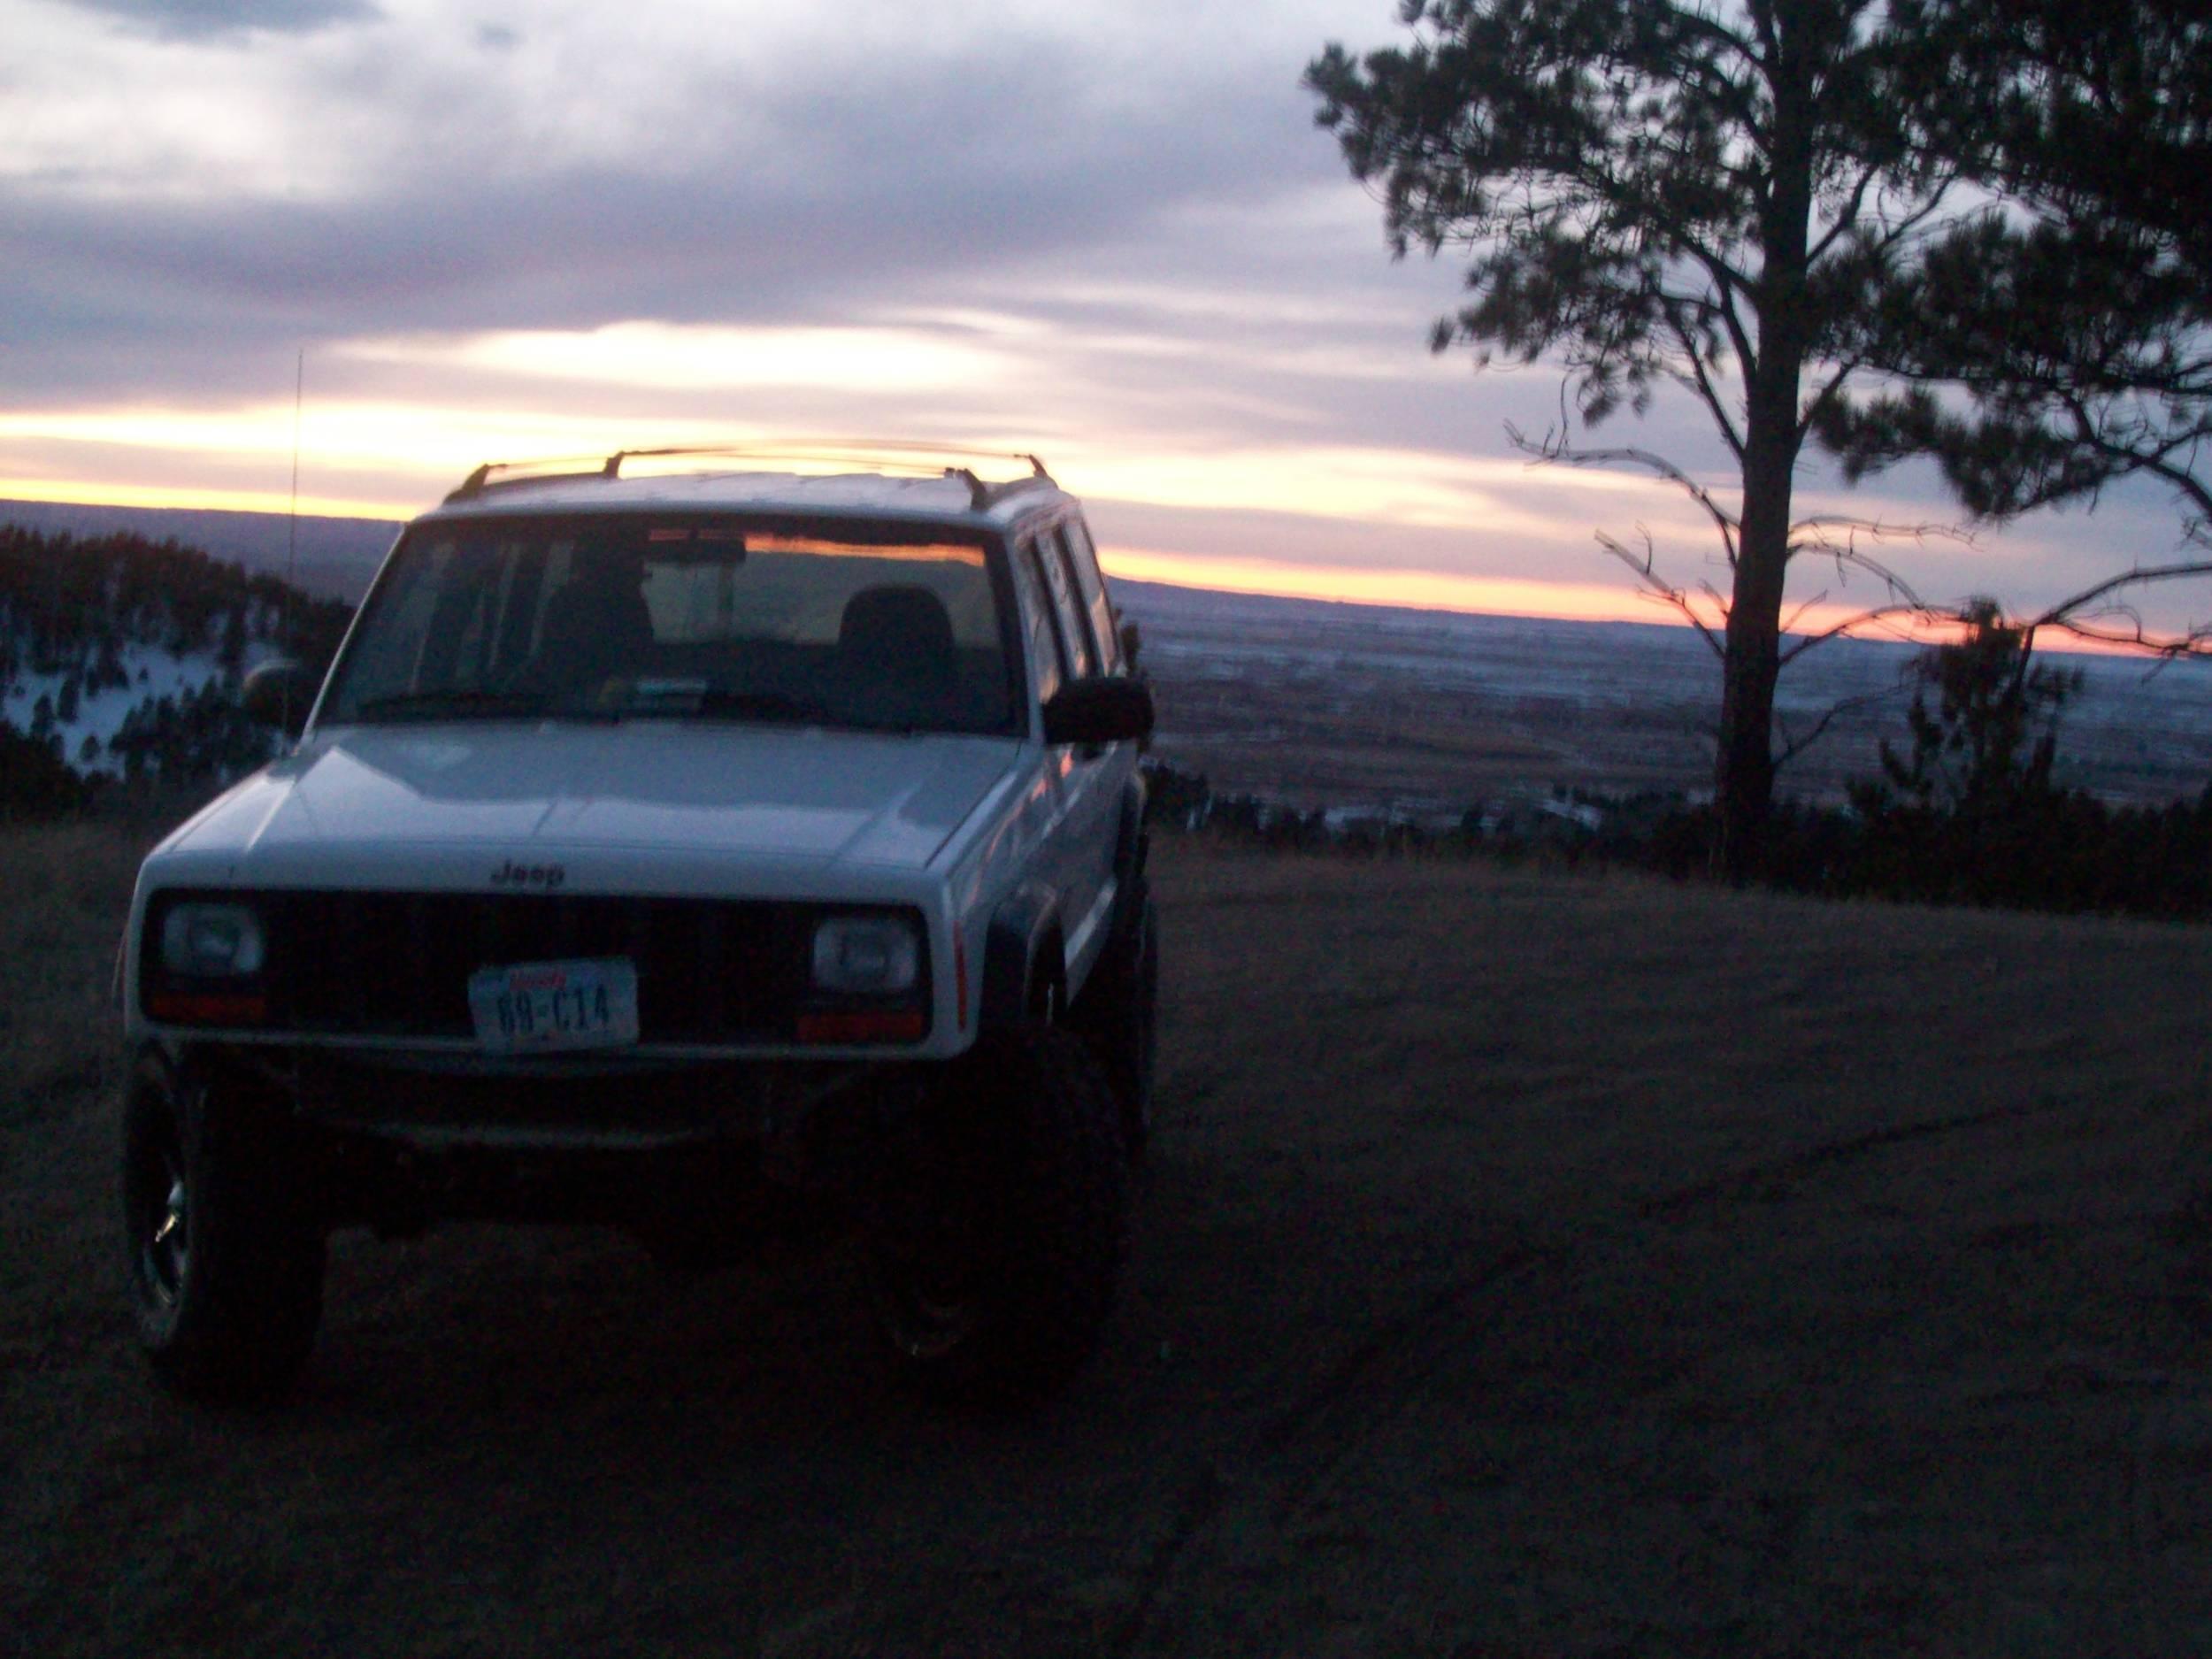 Jeep_Pse_004.JPG